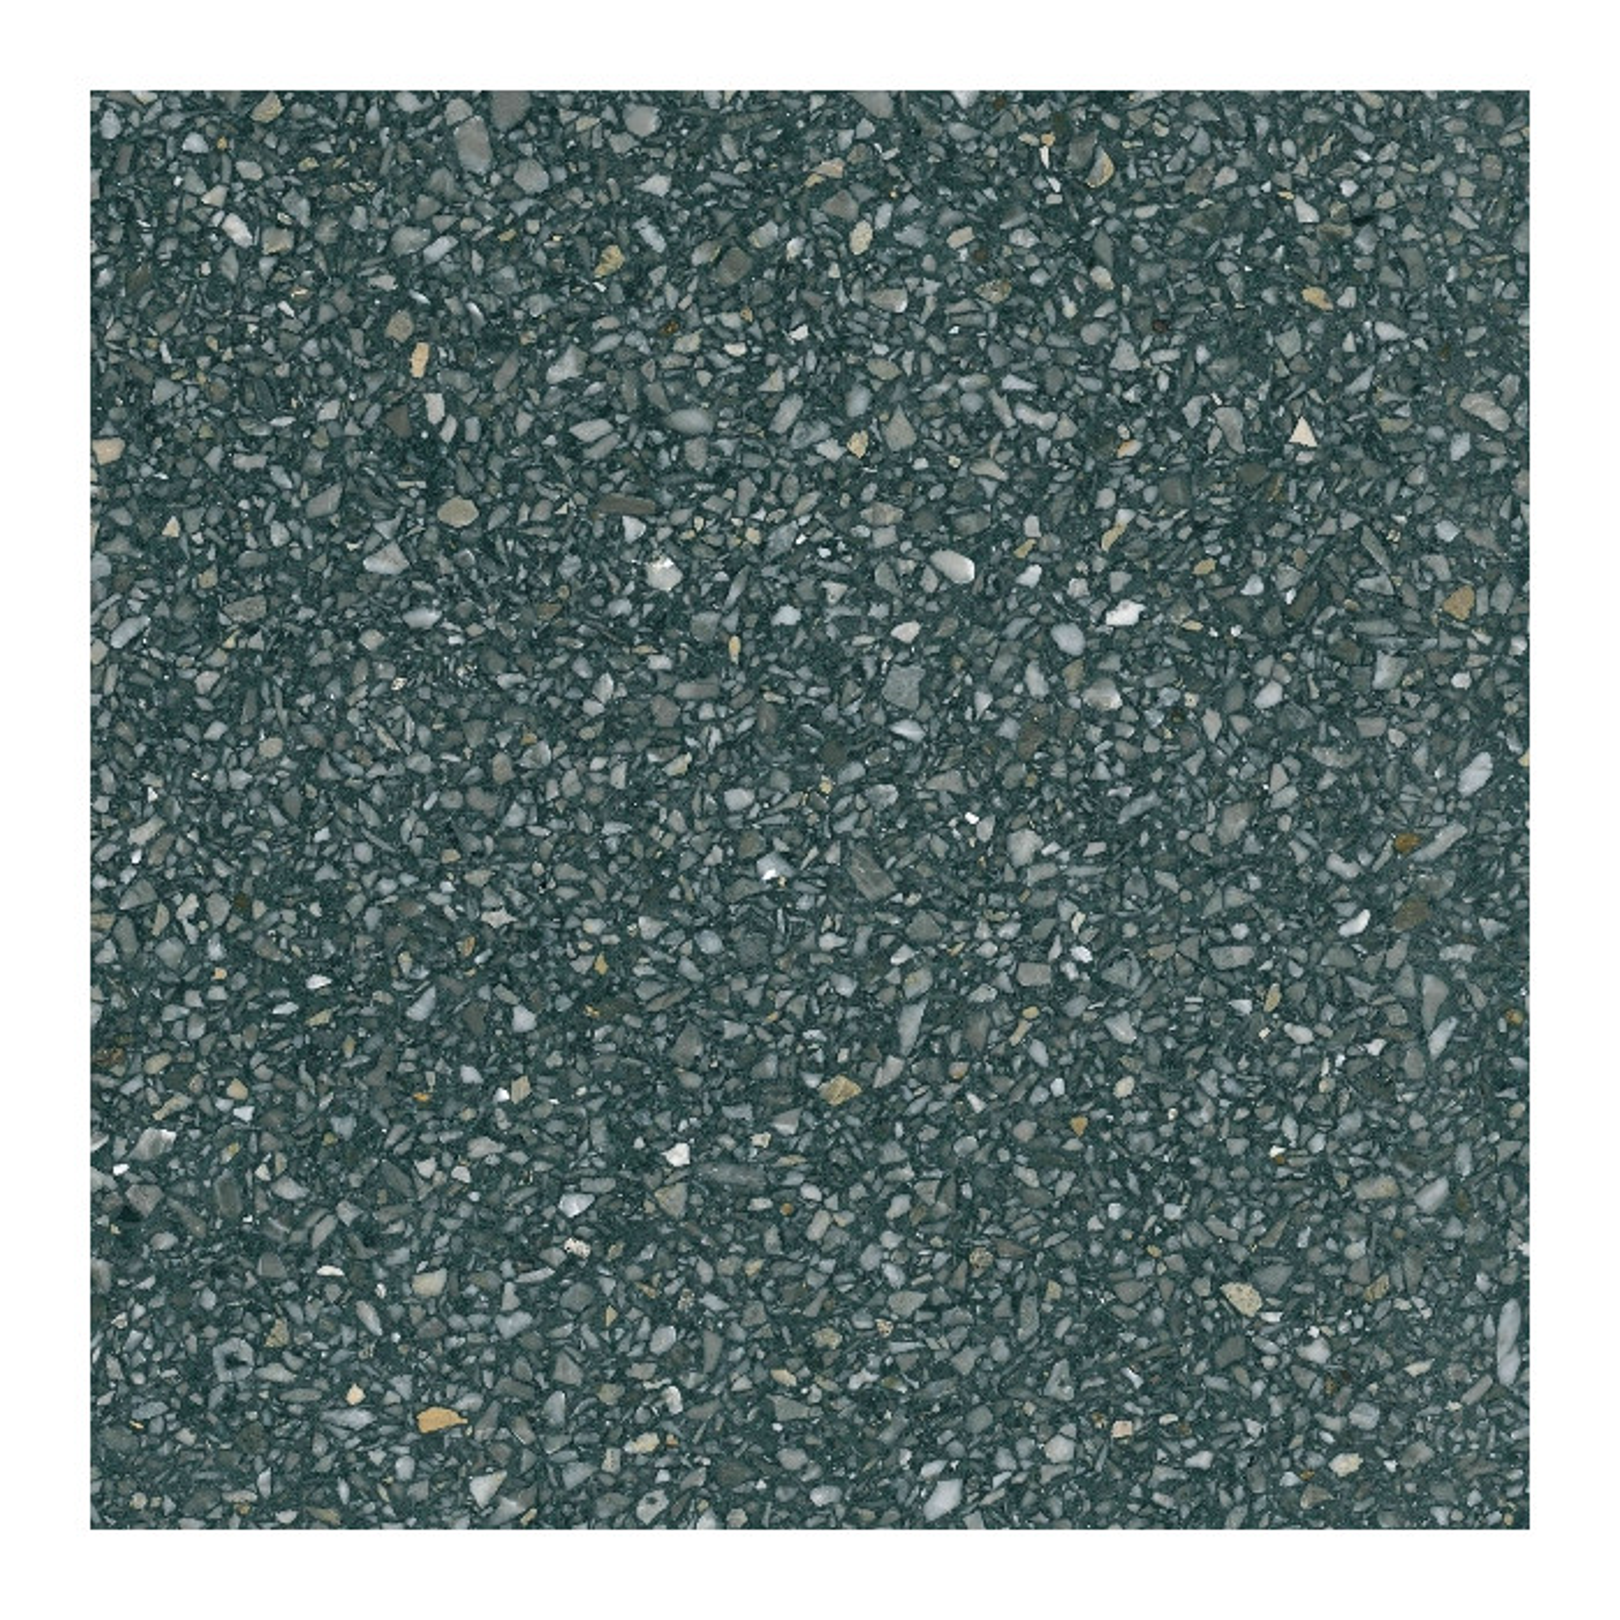 Carreau Terrazzo fond gris foncé inclusions Multicolores Gribel (6 formats)